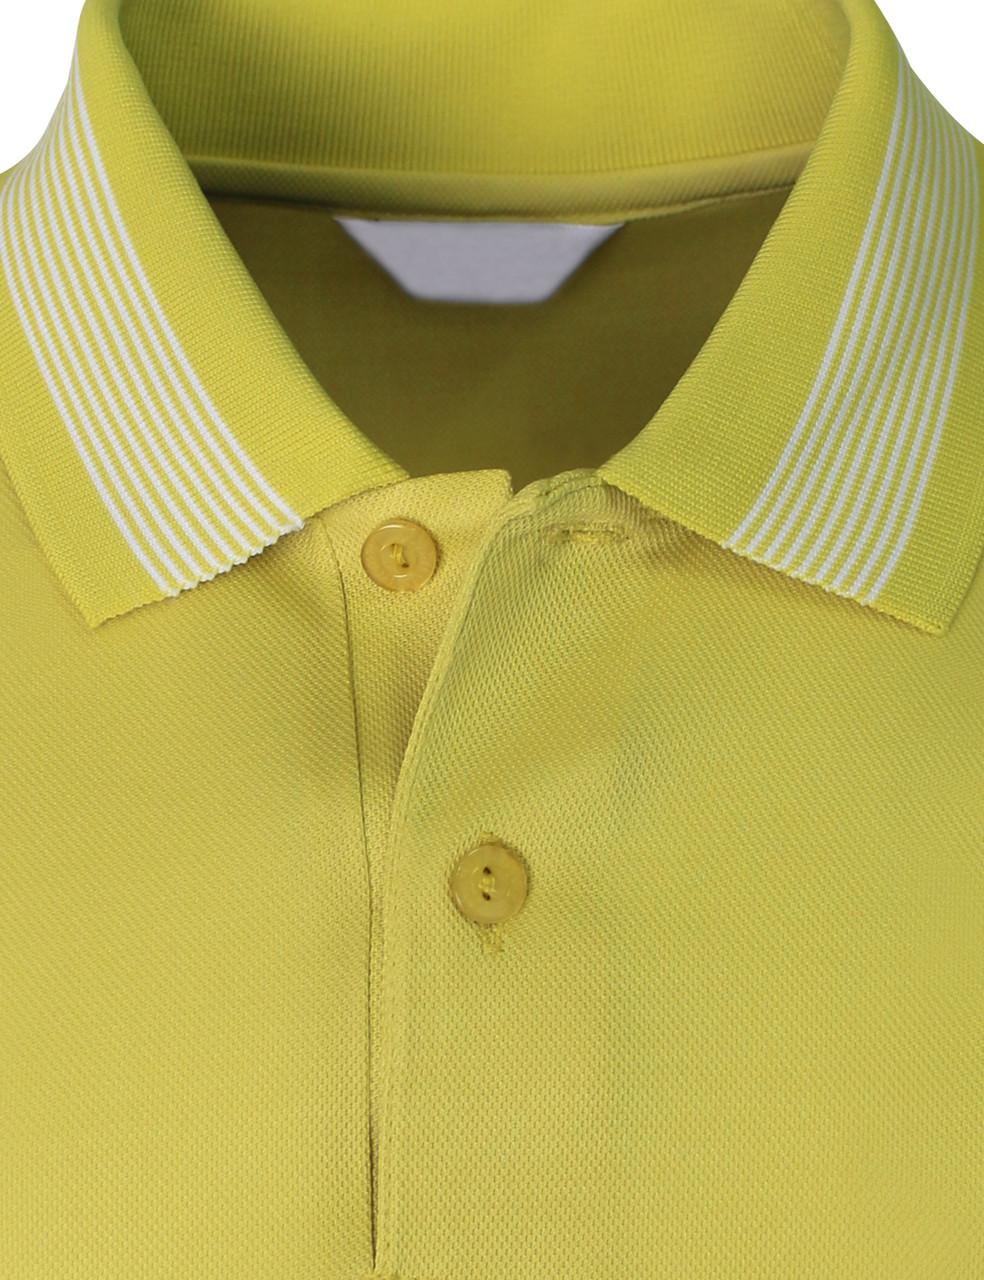 New Summer Polo Shirt Of Short Sleeves Regular Fit Yellow Green